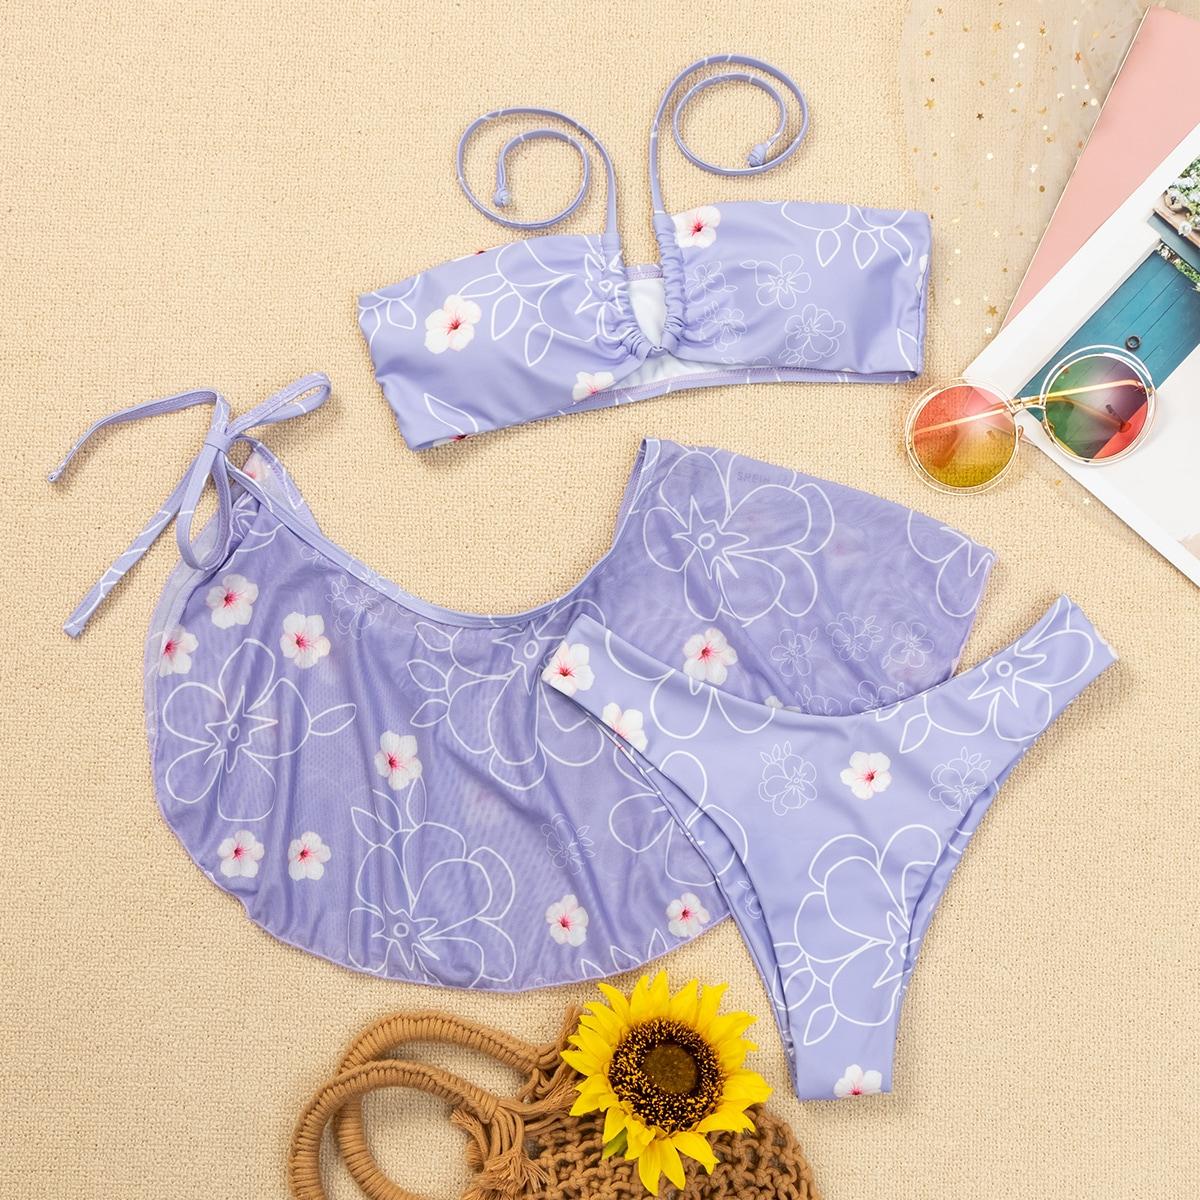 SHEIN / 3pack Floral Halter Bikini Swimsuit & Beach Skirt